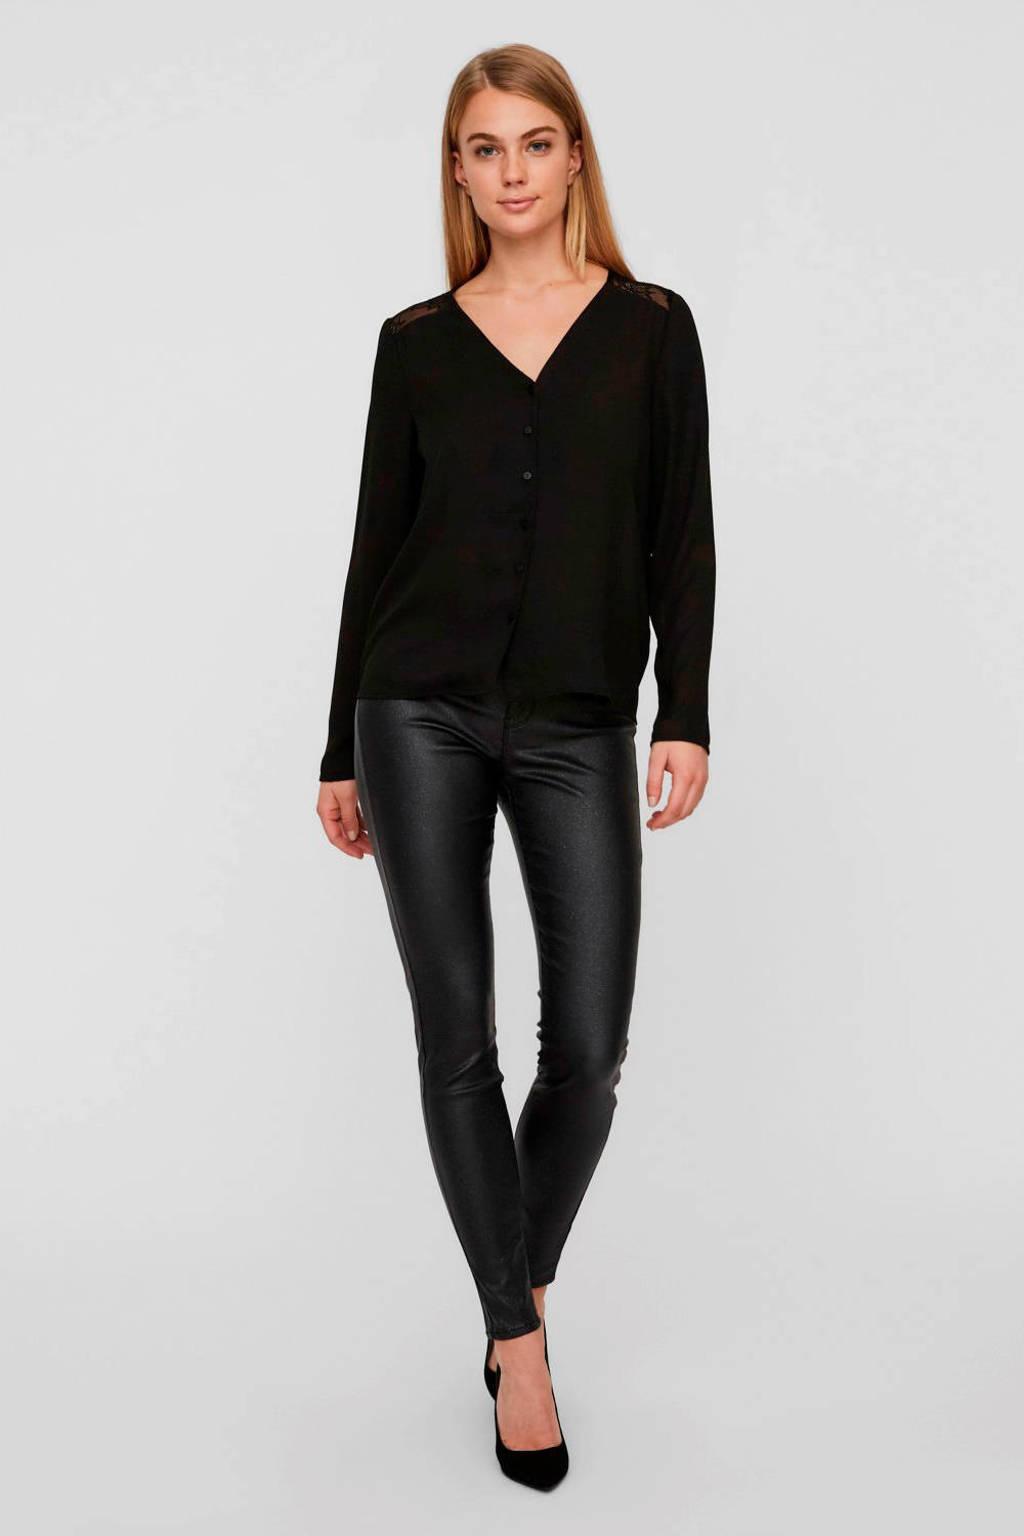 VERO MODA blouse met kant zwart, Zwart